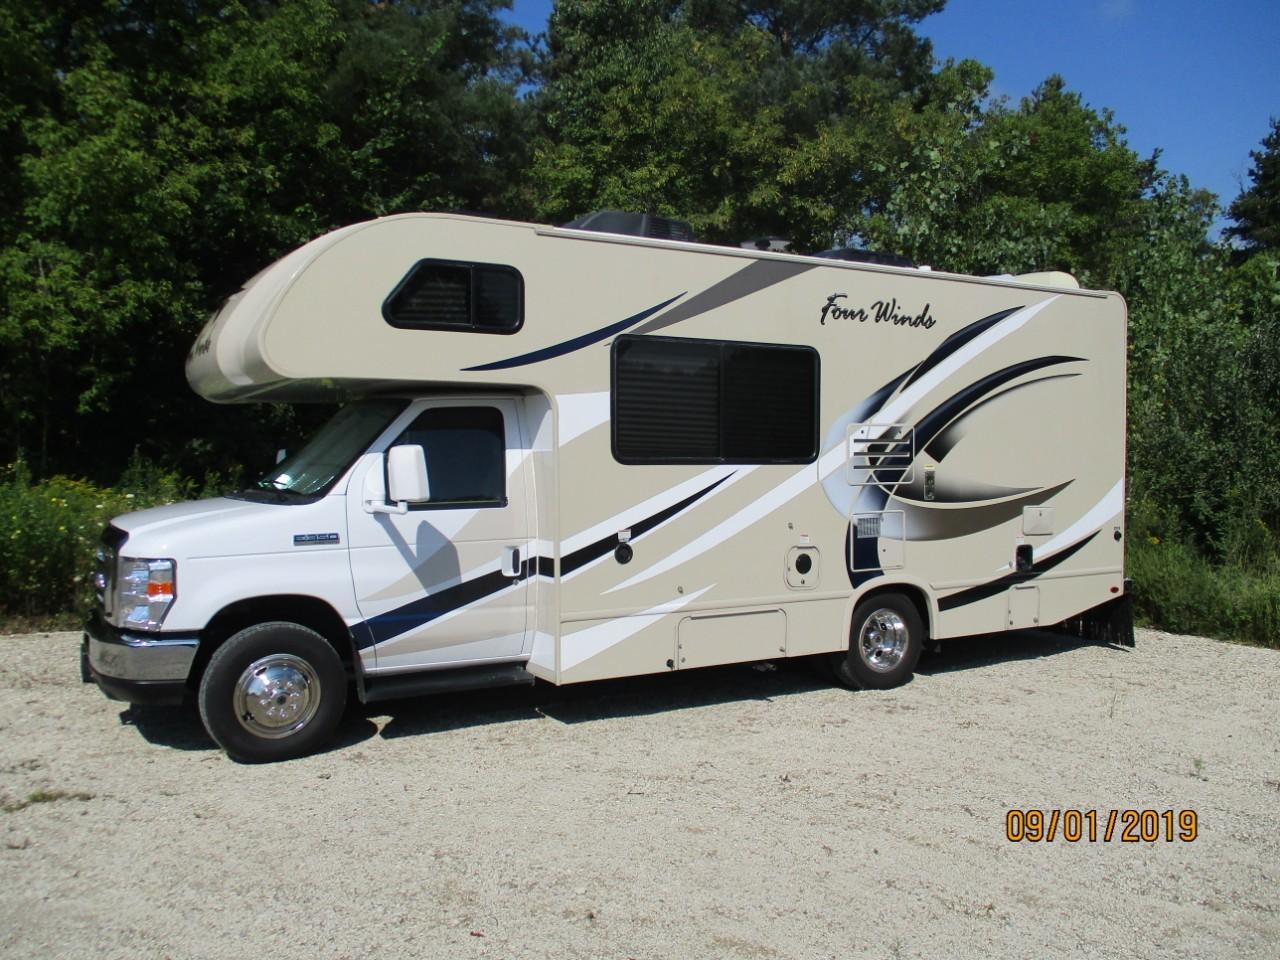 Michigan - Used RVs For Sale - RV Trader